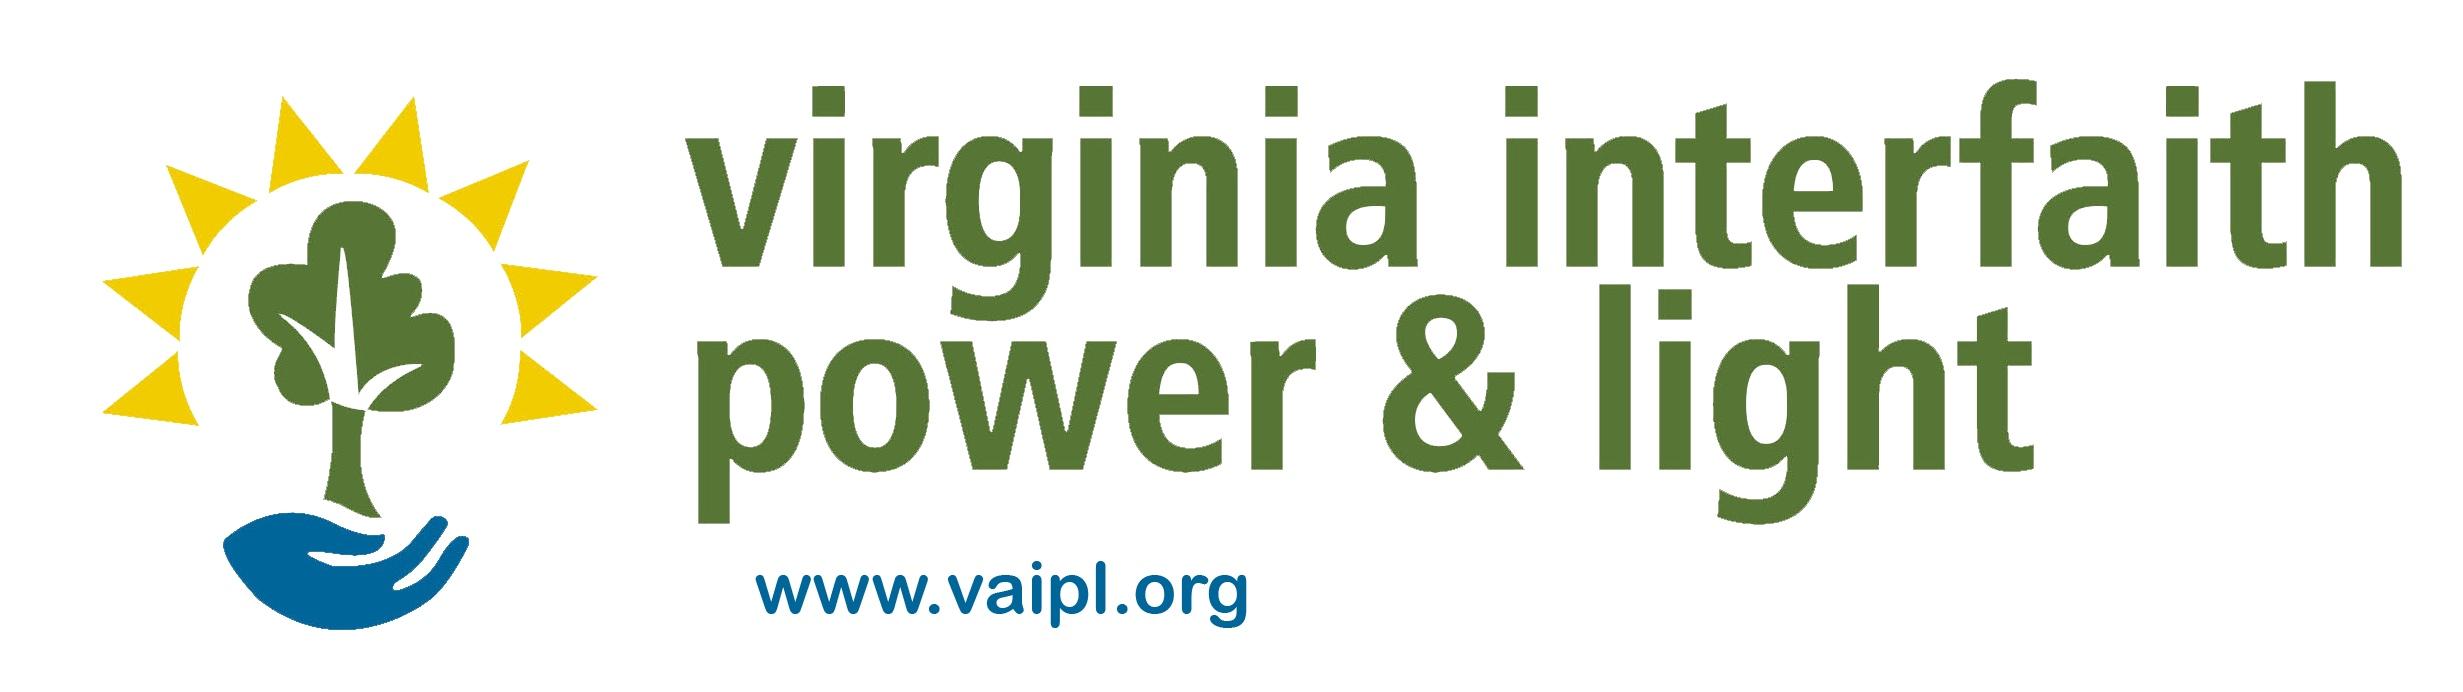 VAIPL_full_logo.jpg